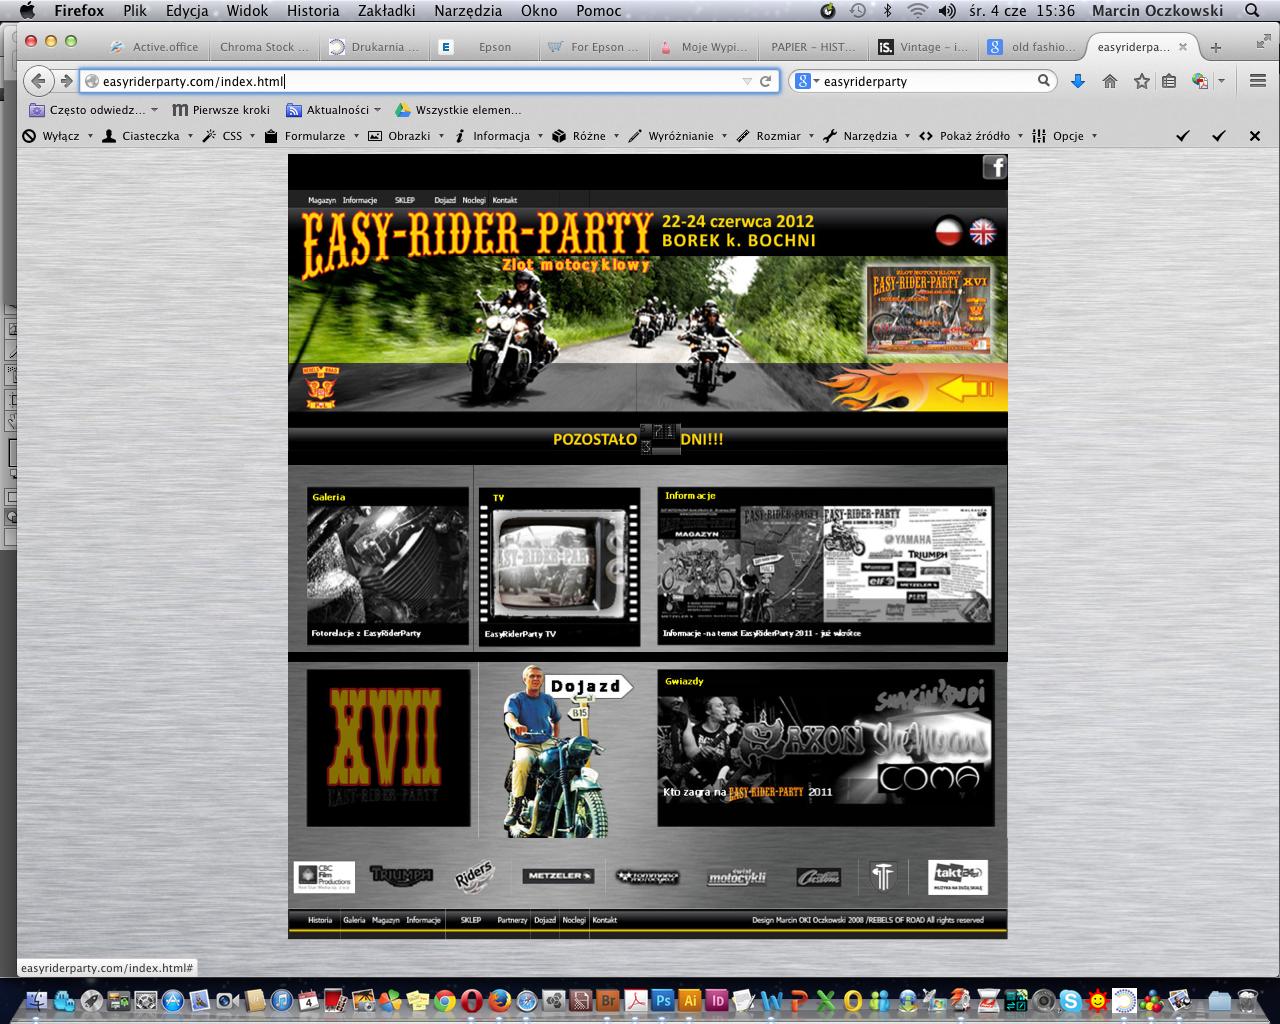 Zrzut ekranu 2014-06-4 o 15.36.06